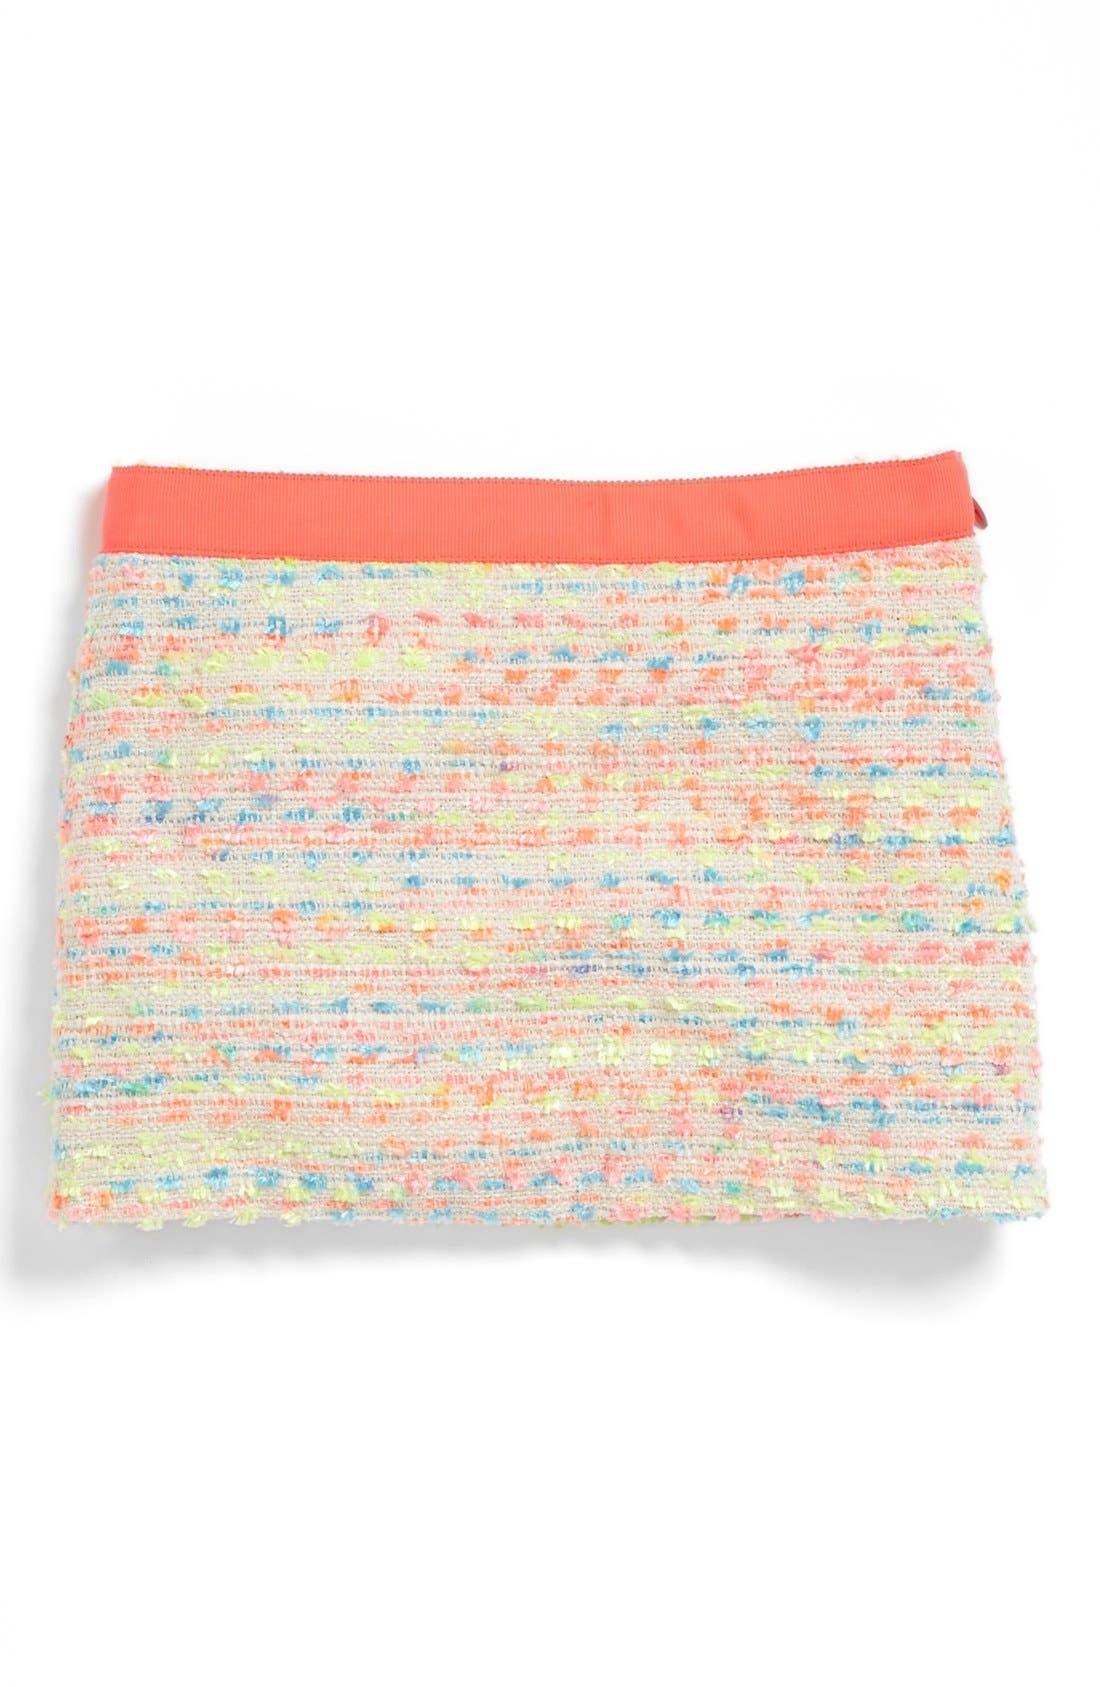 Alternate Image 1 Selected - Milly Minis Neon Tweed Skirt (Big Girls)